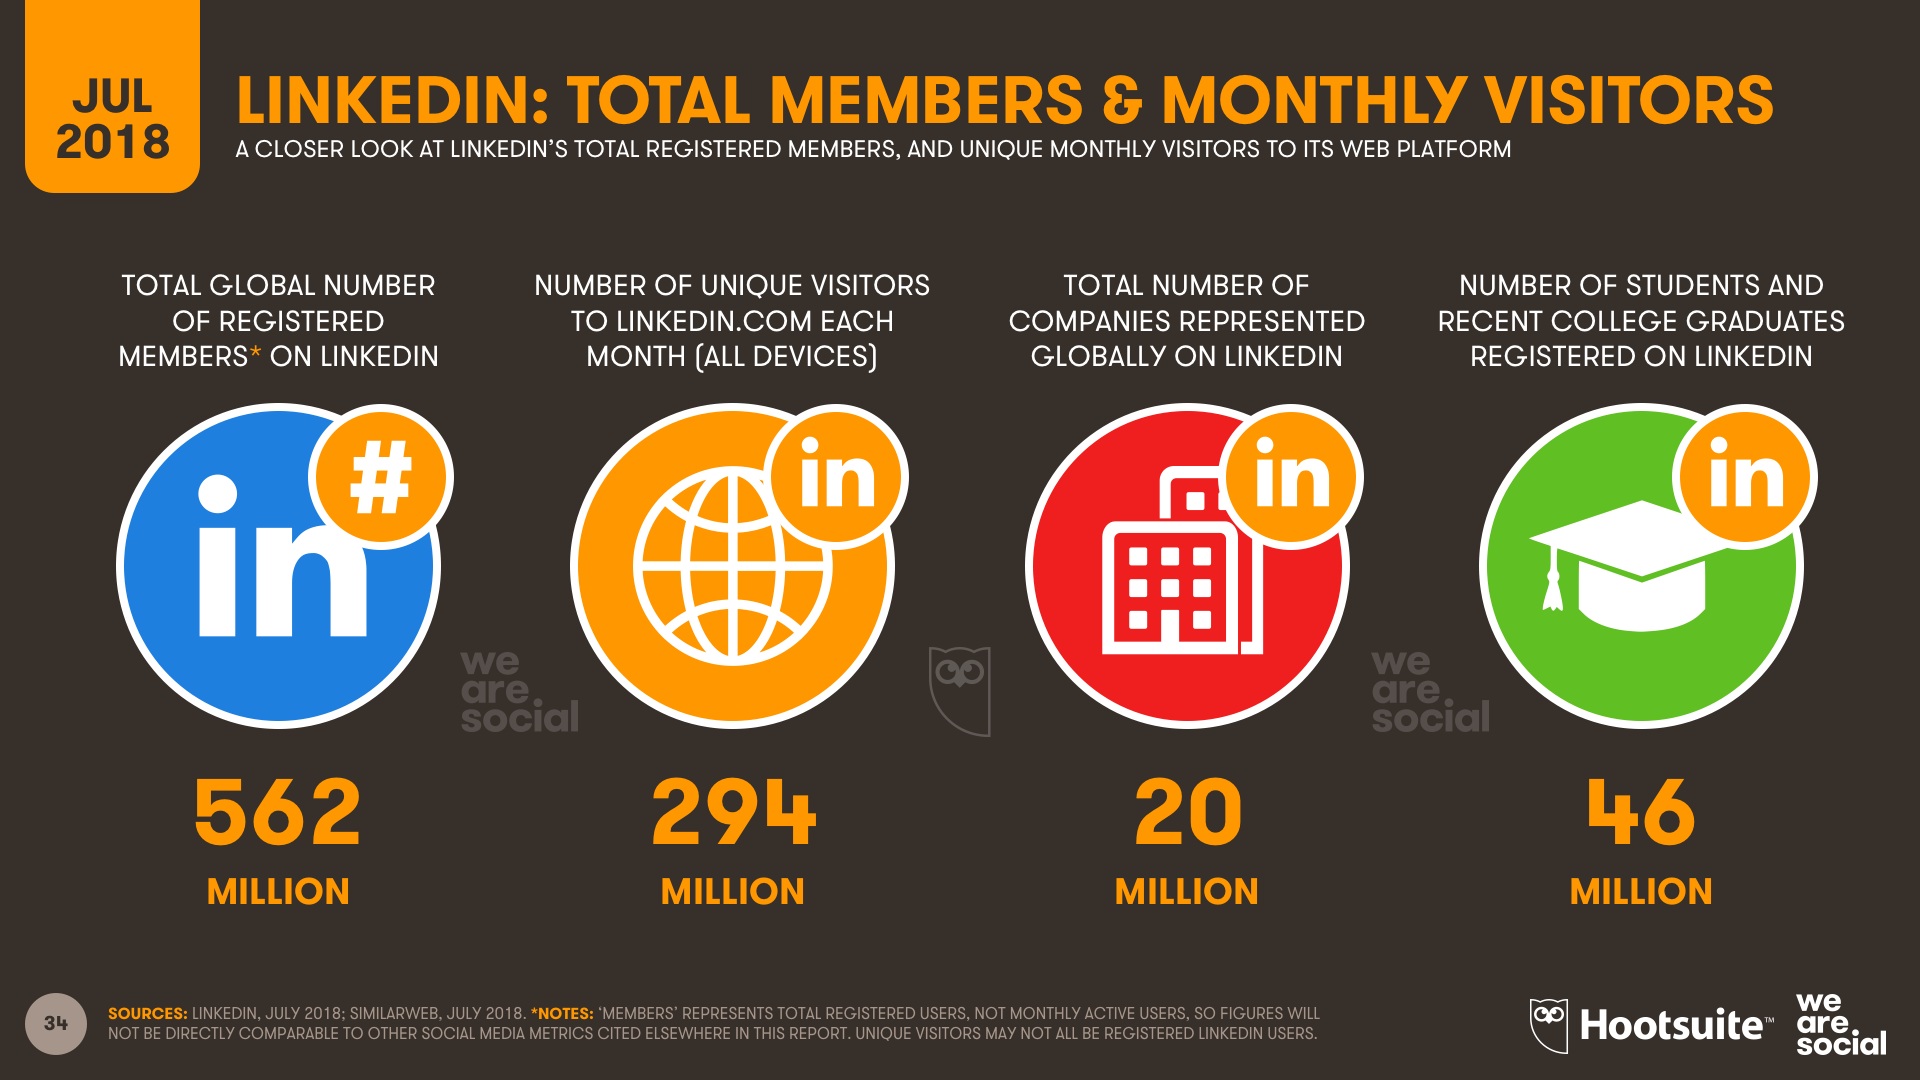 Q3 2018 - LinkedIn Overview